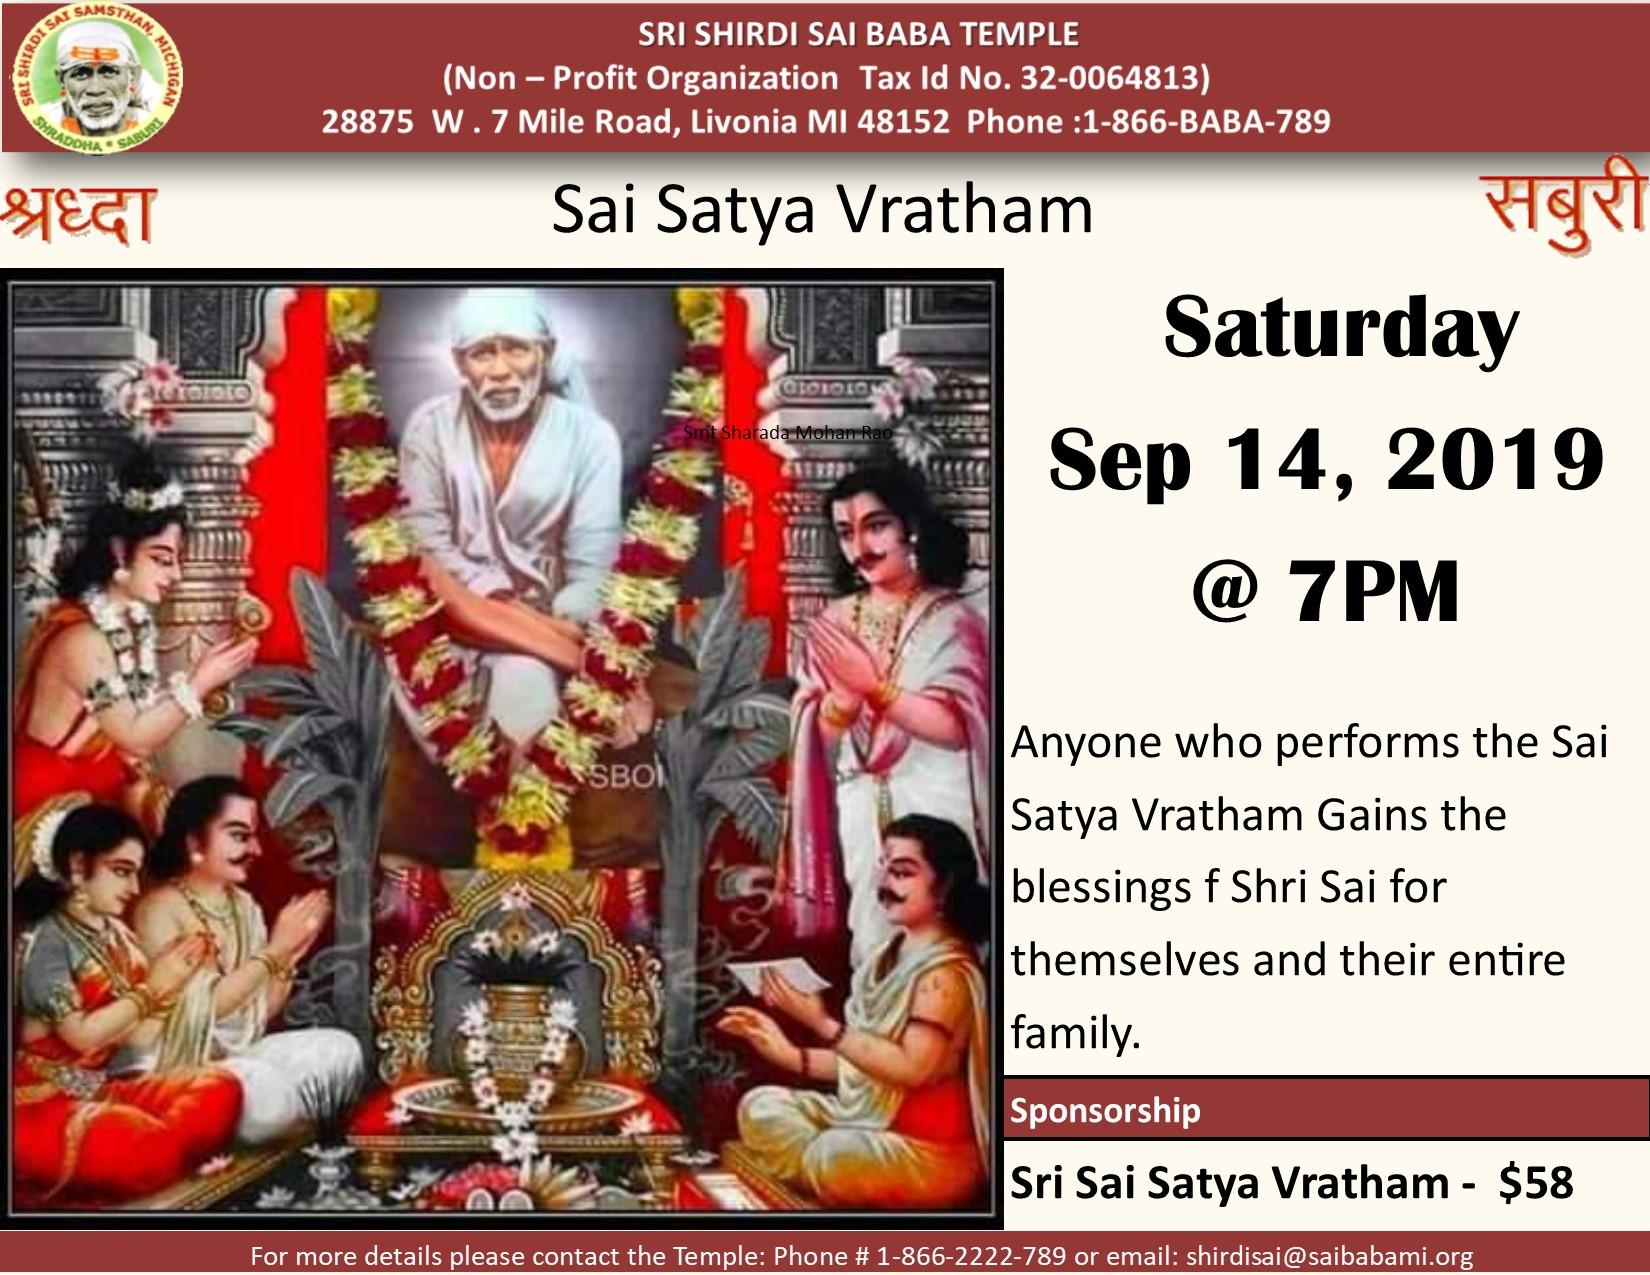 Welcome to Sri Shirdi Saibaba Temple ::